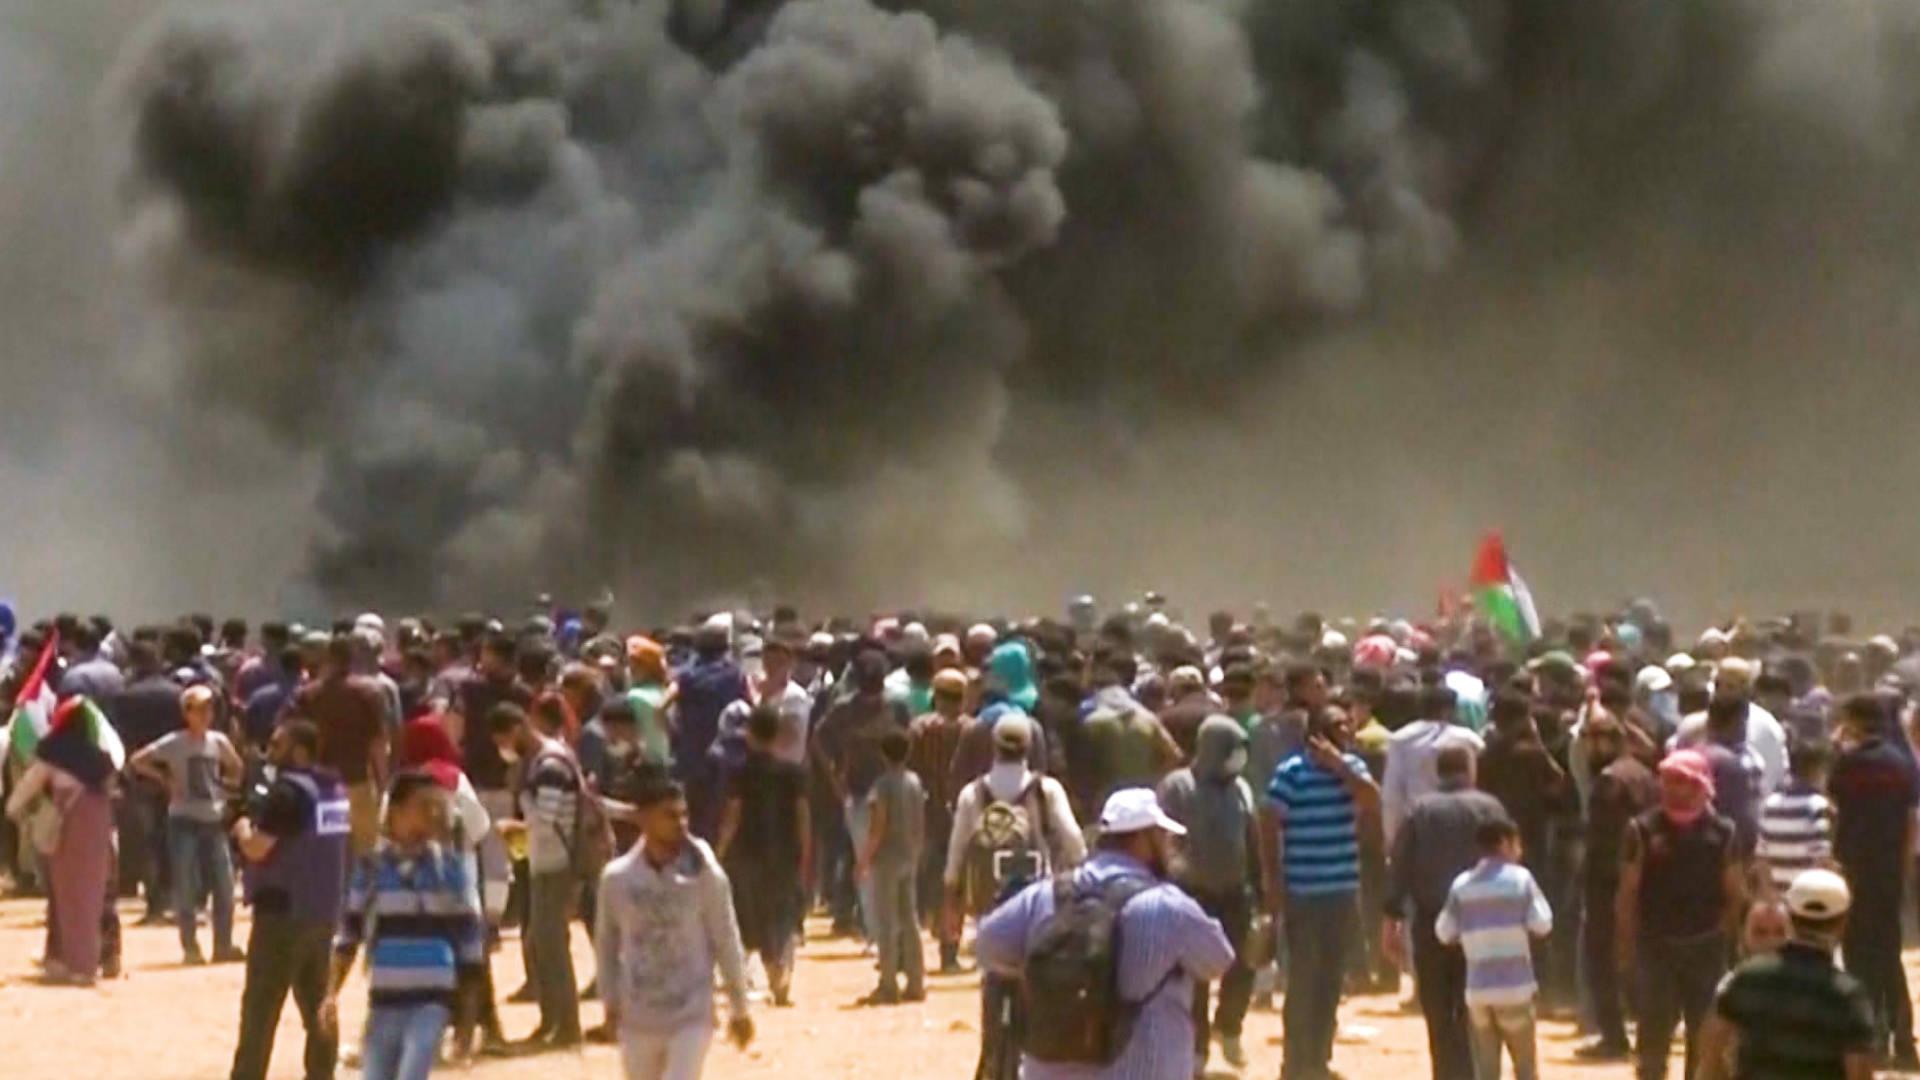 Gaza: Israeli Soldiers Kill 30+ Palestinians Protesting Nonviolently as U.S. Opens Jerusalem Embassy